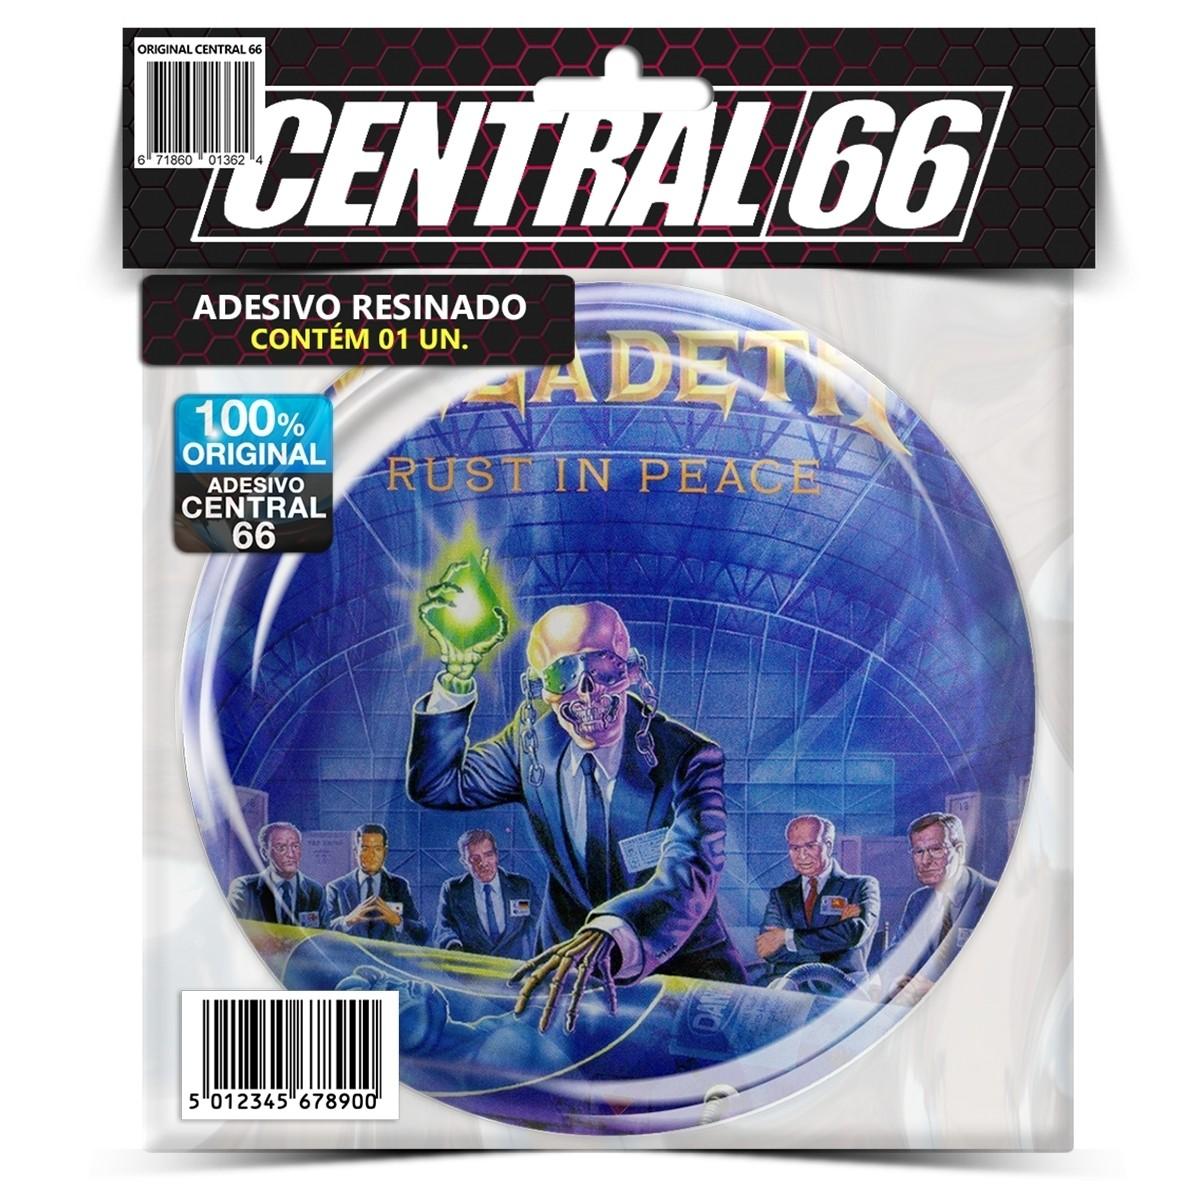 Adesivo Redondo Megadeth Rust in Peace – Central 66